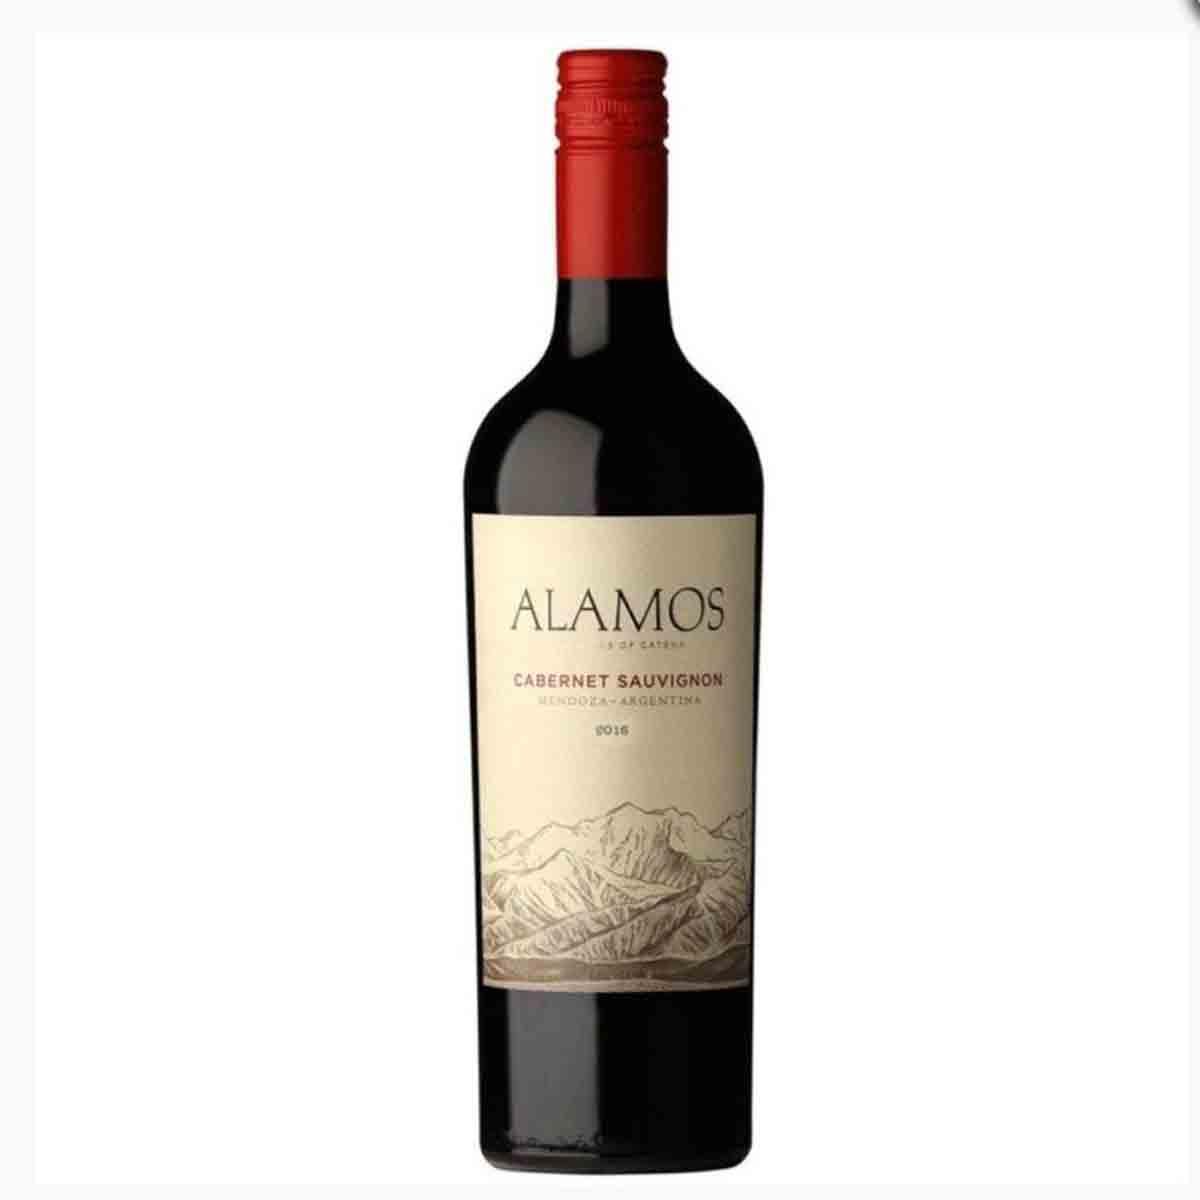 Vinho Tinto Argentino Alamos Cabernet Sauvignon 2018 Catena Zapata